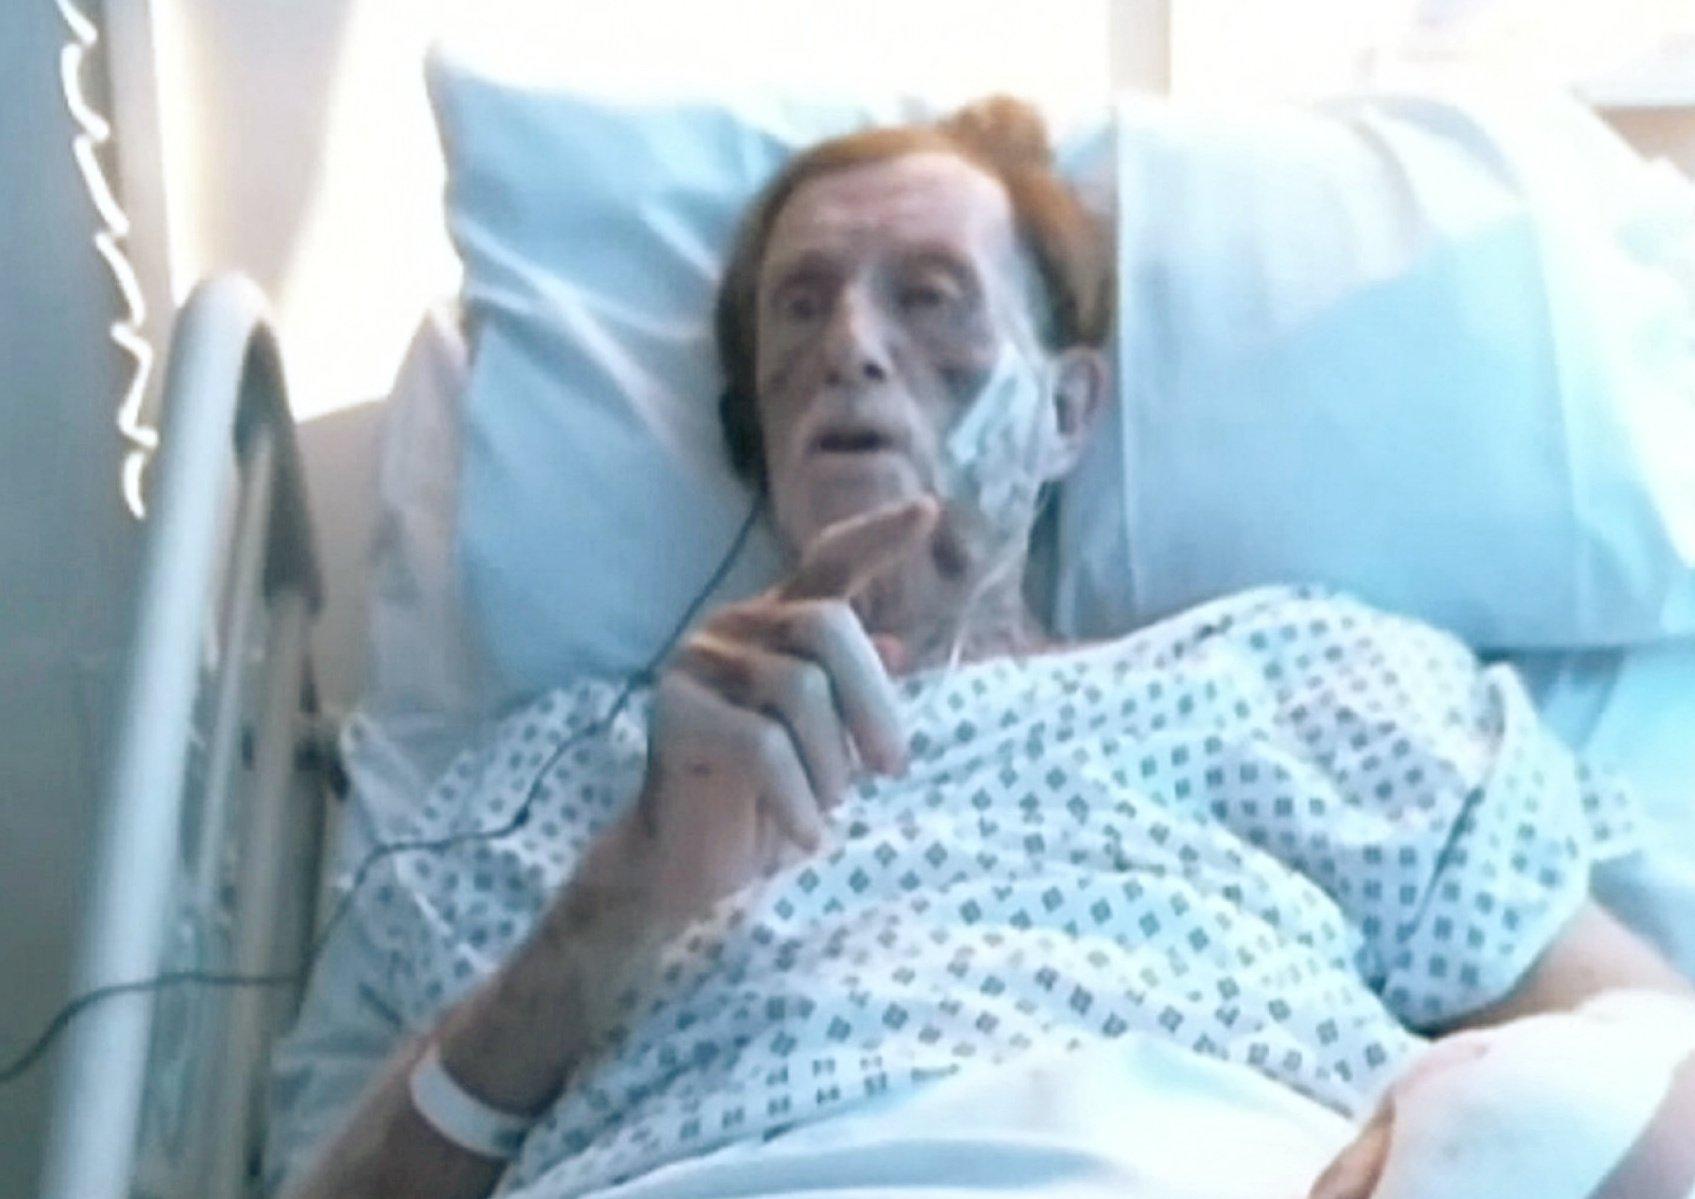 Traveller guilty of killing pensioner, 87, whose hands were skinned in burglary